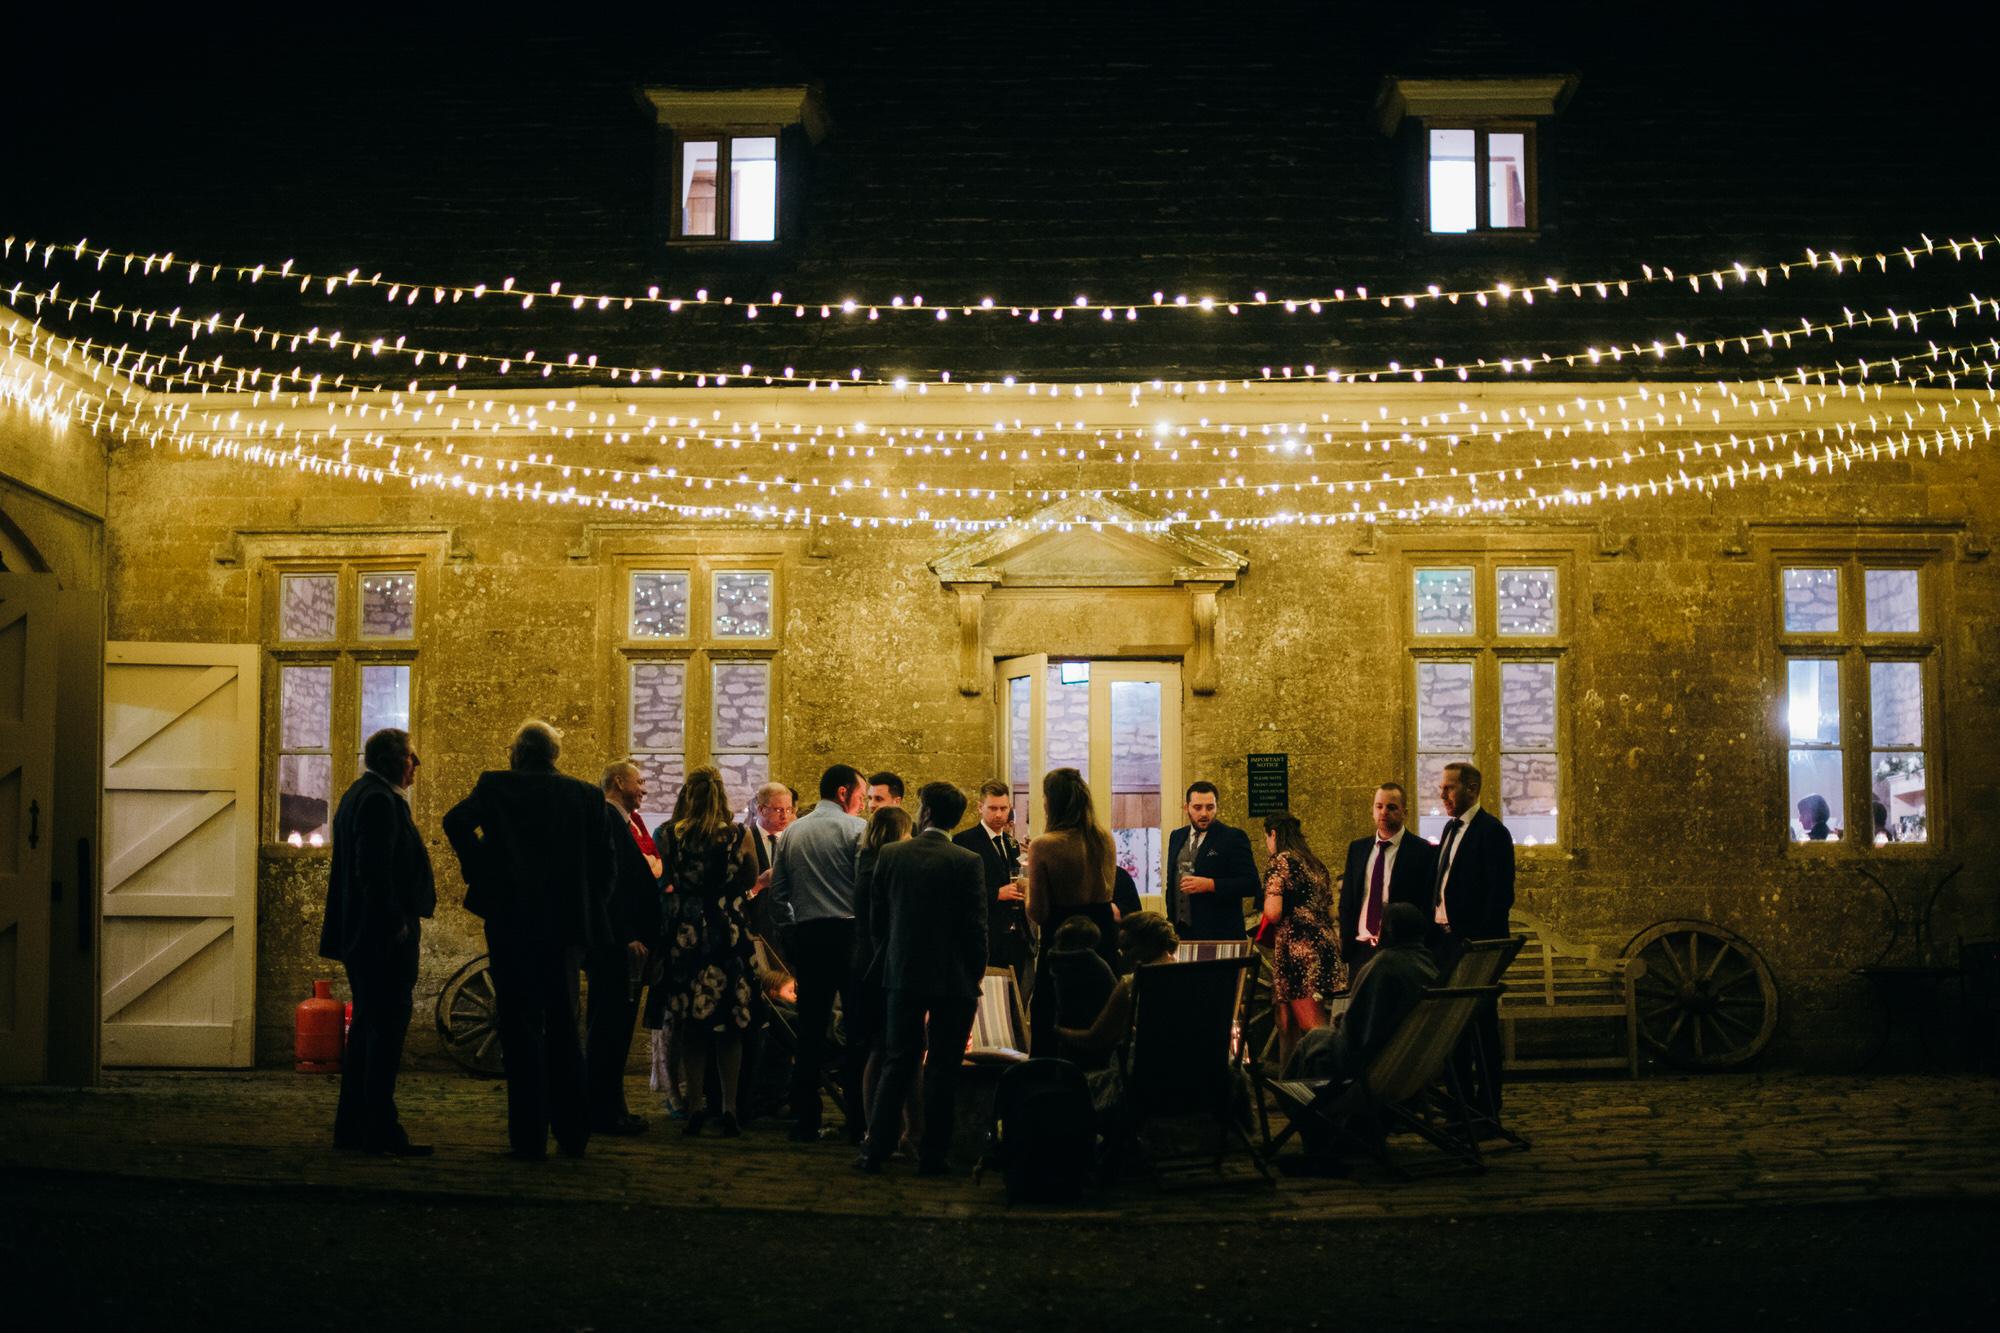 Brympton house evening reception